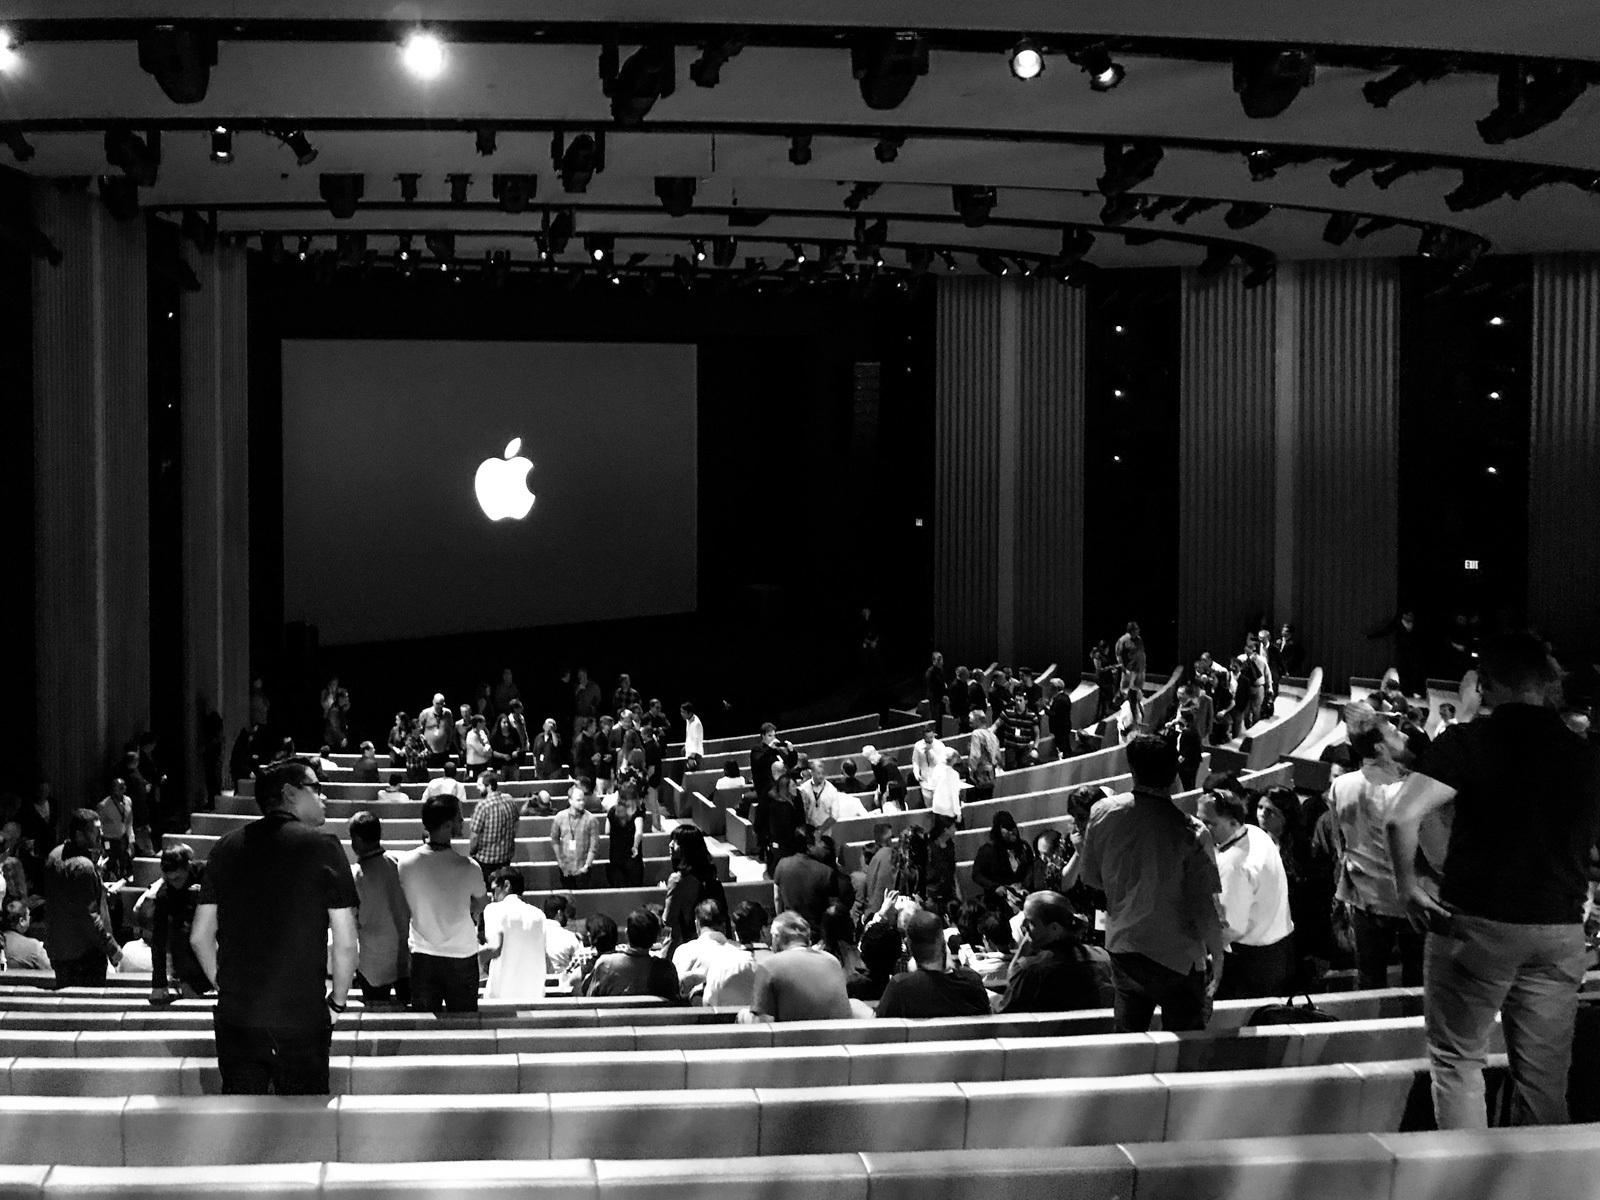 large_apple-steve-jobs-theater-4.jpg